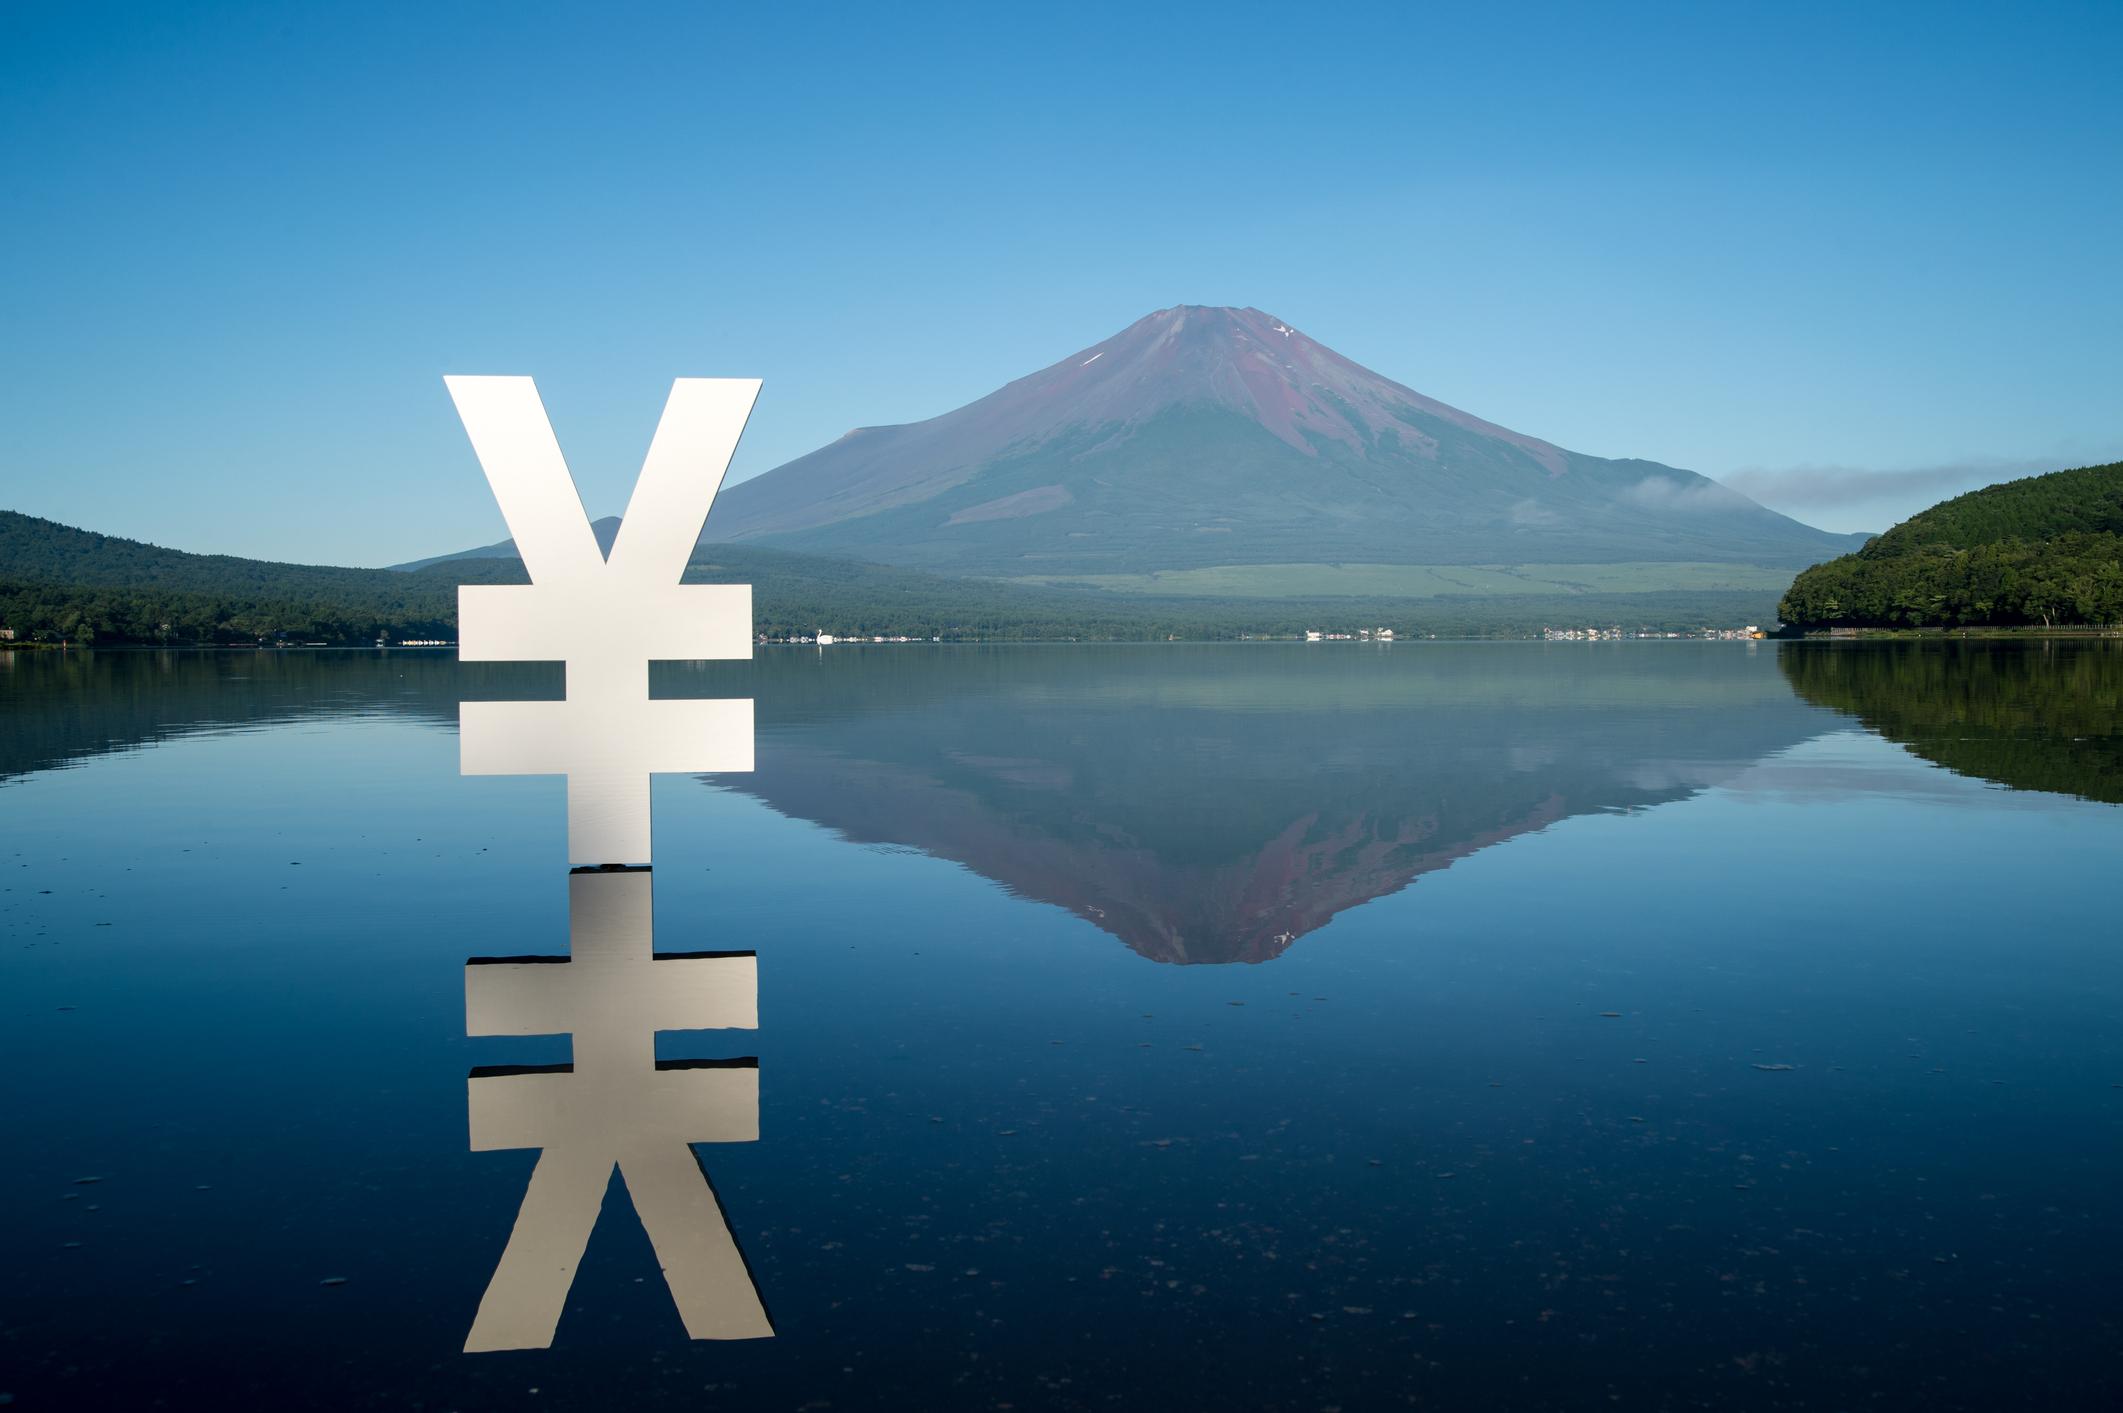 Japanese currency Yen shape object and its reflection in Yamanaka lake near by Mt. Fuji in Shizuoka Prefecture.